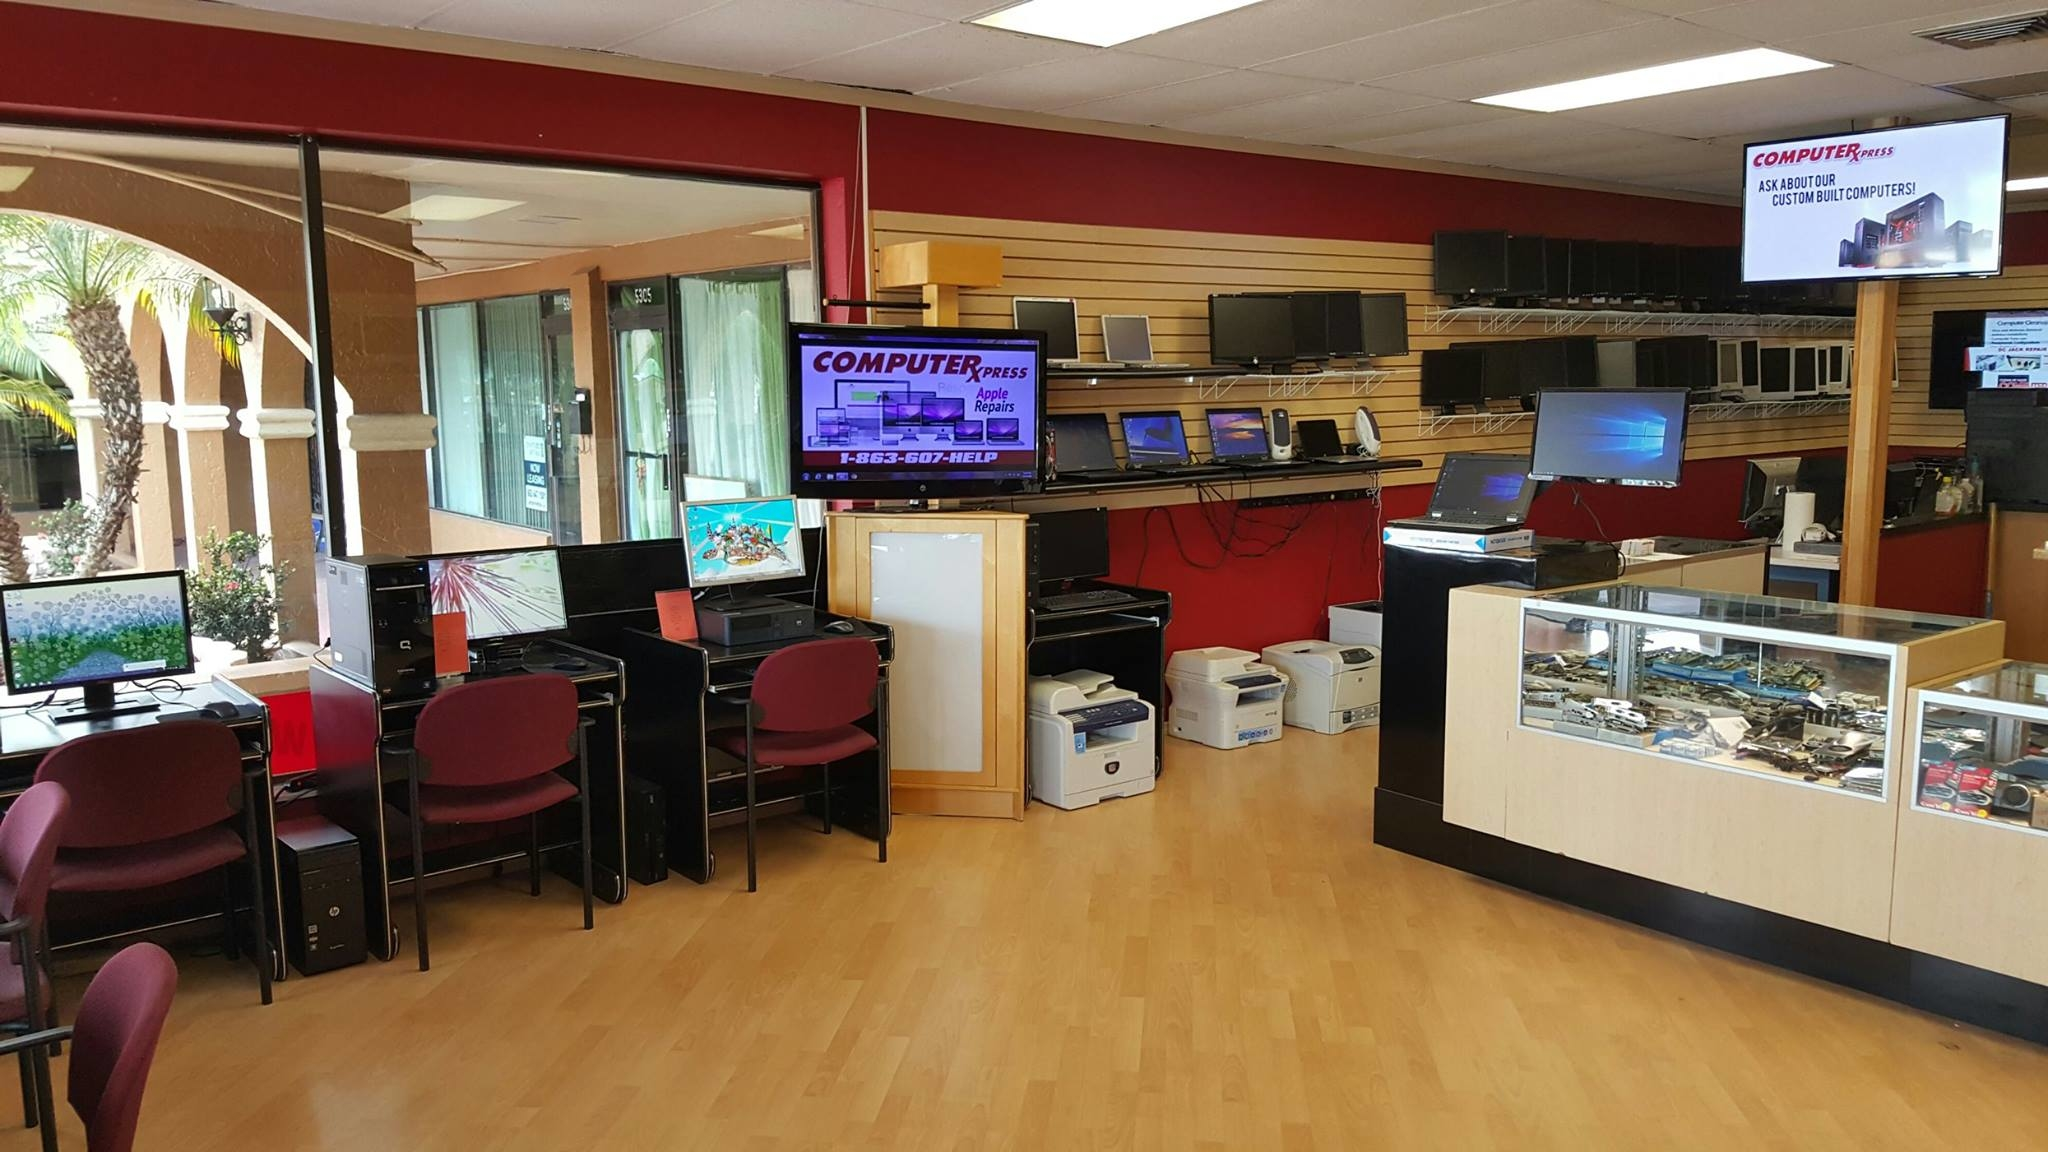 ComputerXpress - Computer Repair Services Lakeland FL image 2